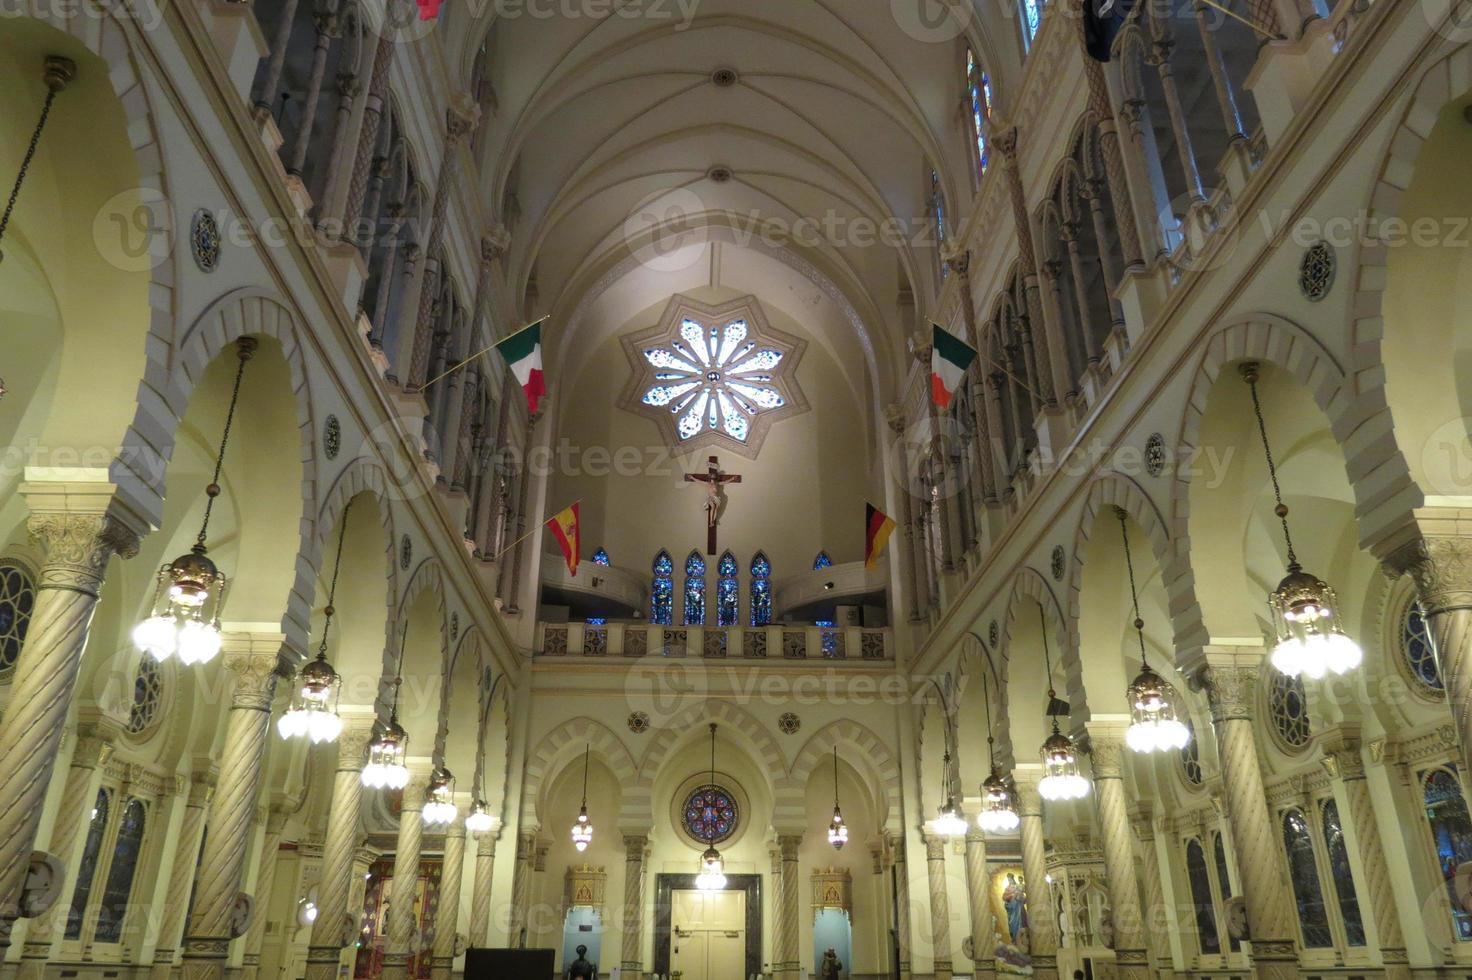 nave iluminada da igreja foto